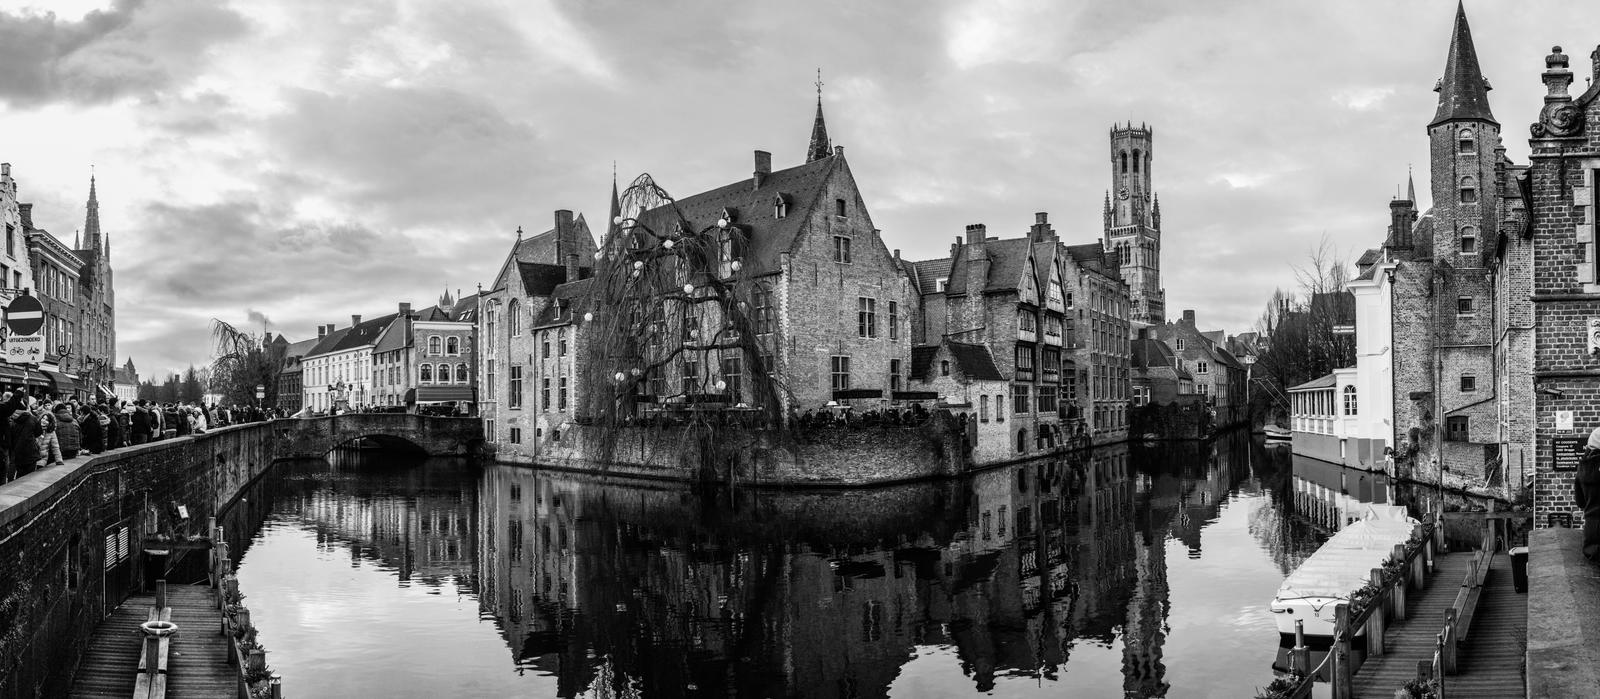 Brugge - 3 BW by VooDooMania